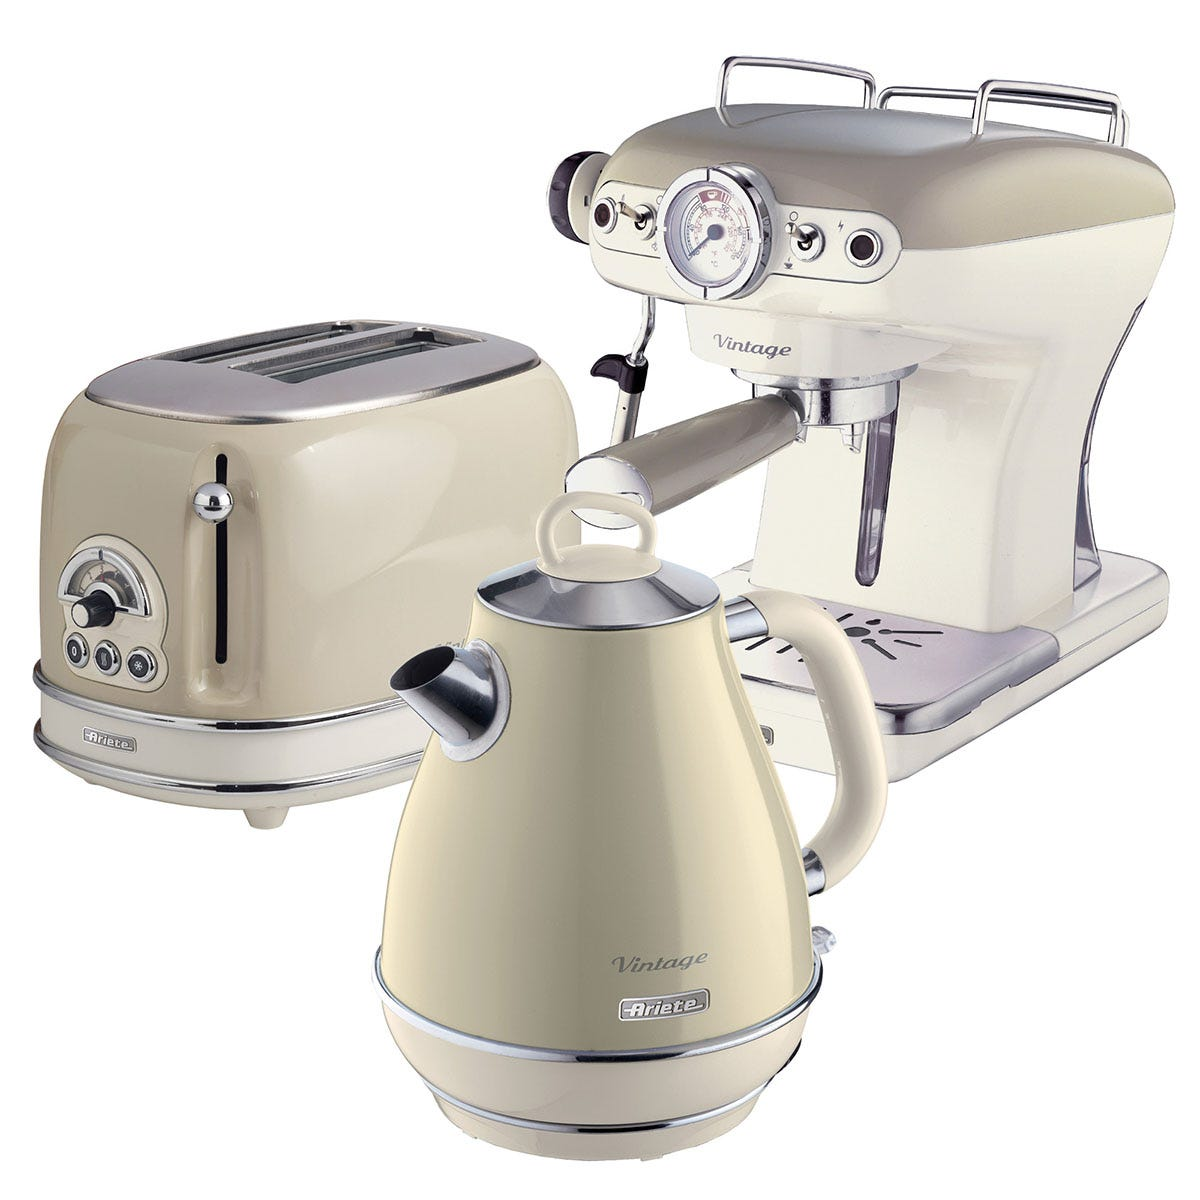 Ariete ARPK4 Vintage 2-Slice Toaster, 1.7L Fast Boil Jug Kettle, and Espresso Coffee Maker - Cream